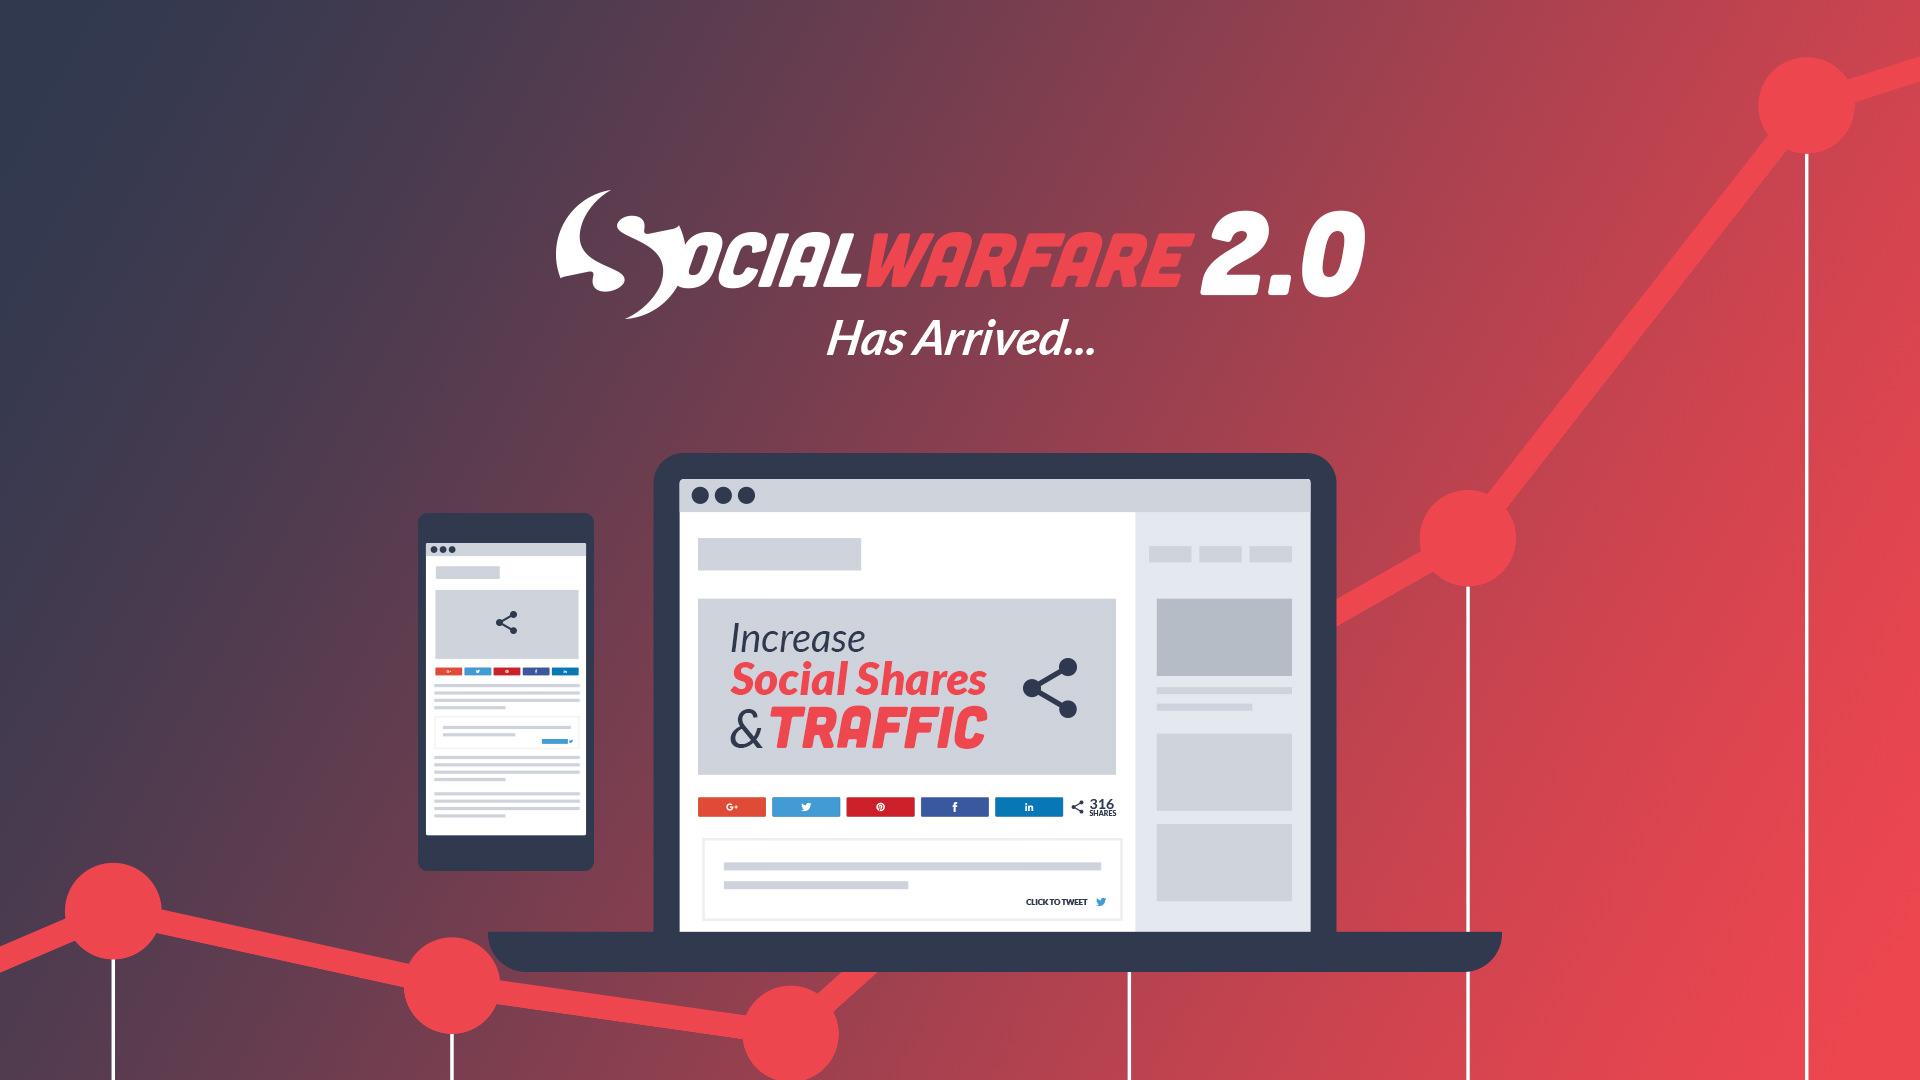 social warfare 2.0 launches